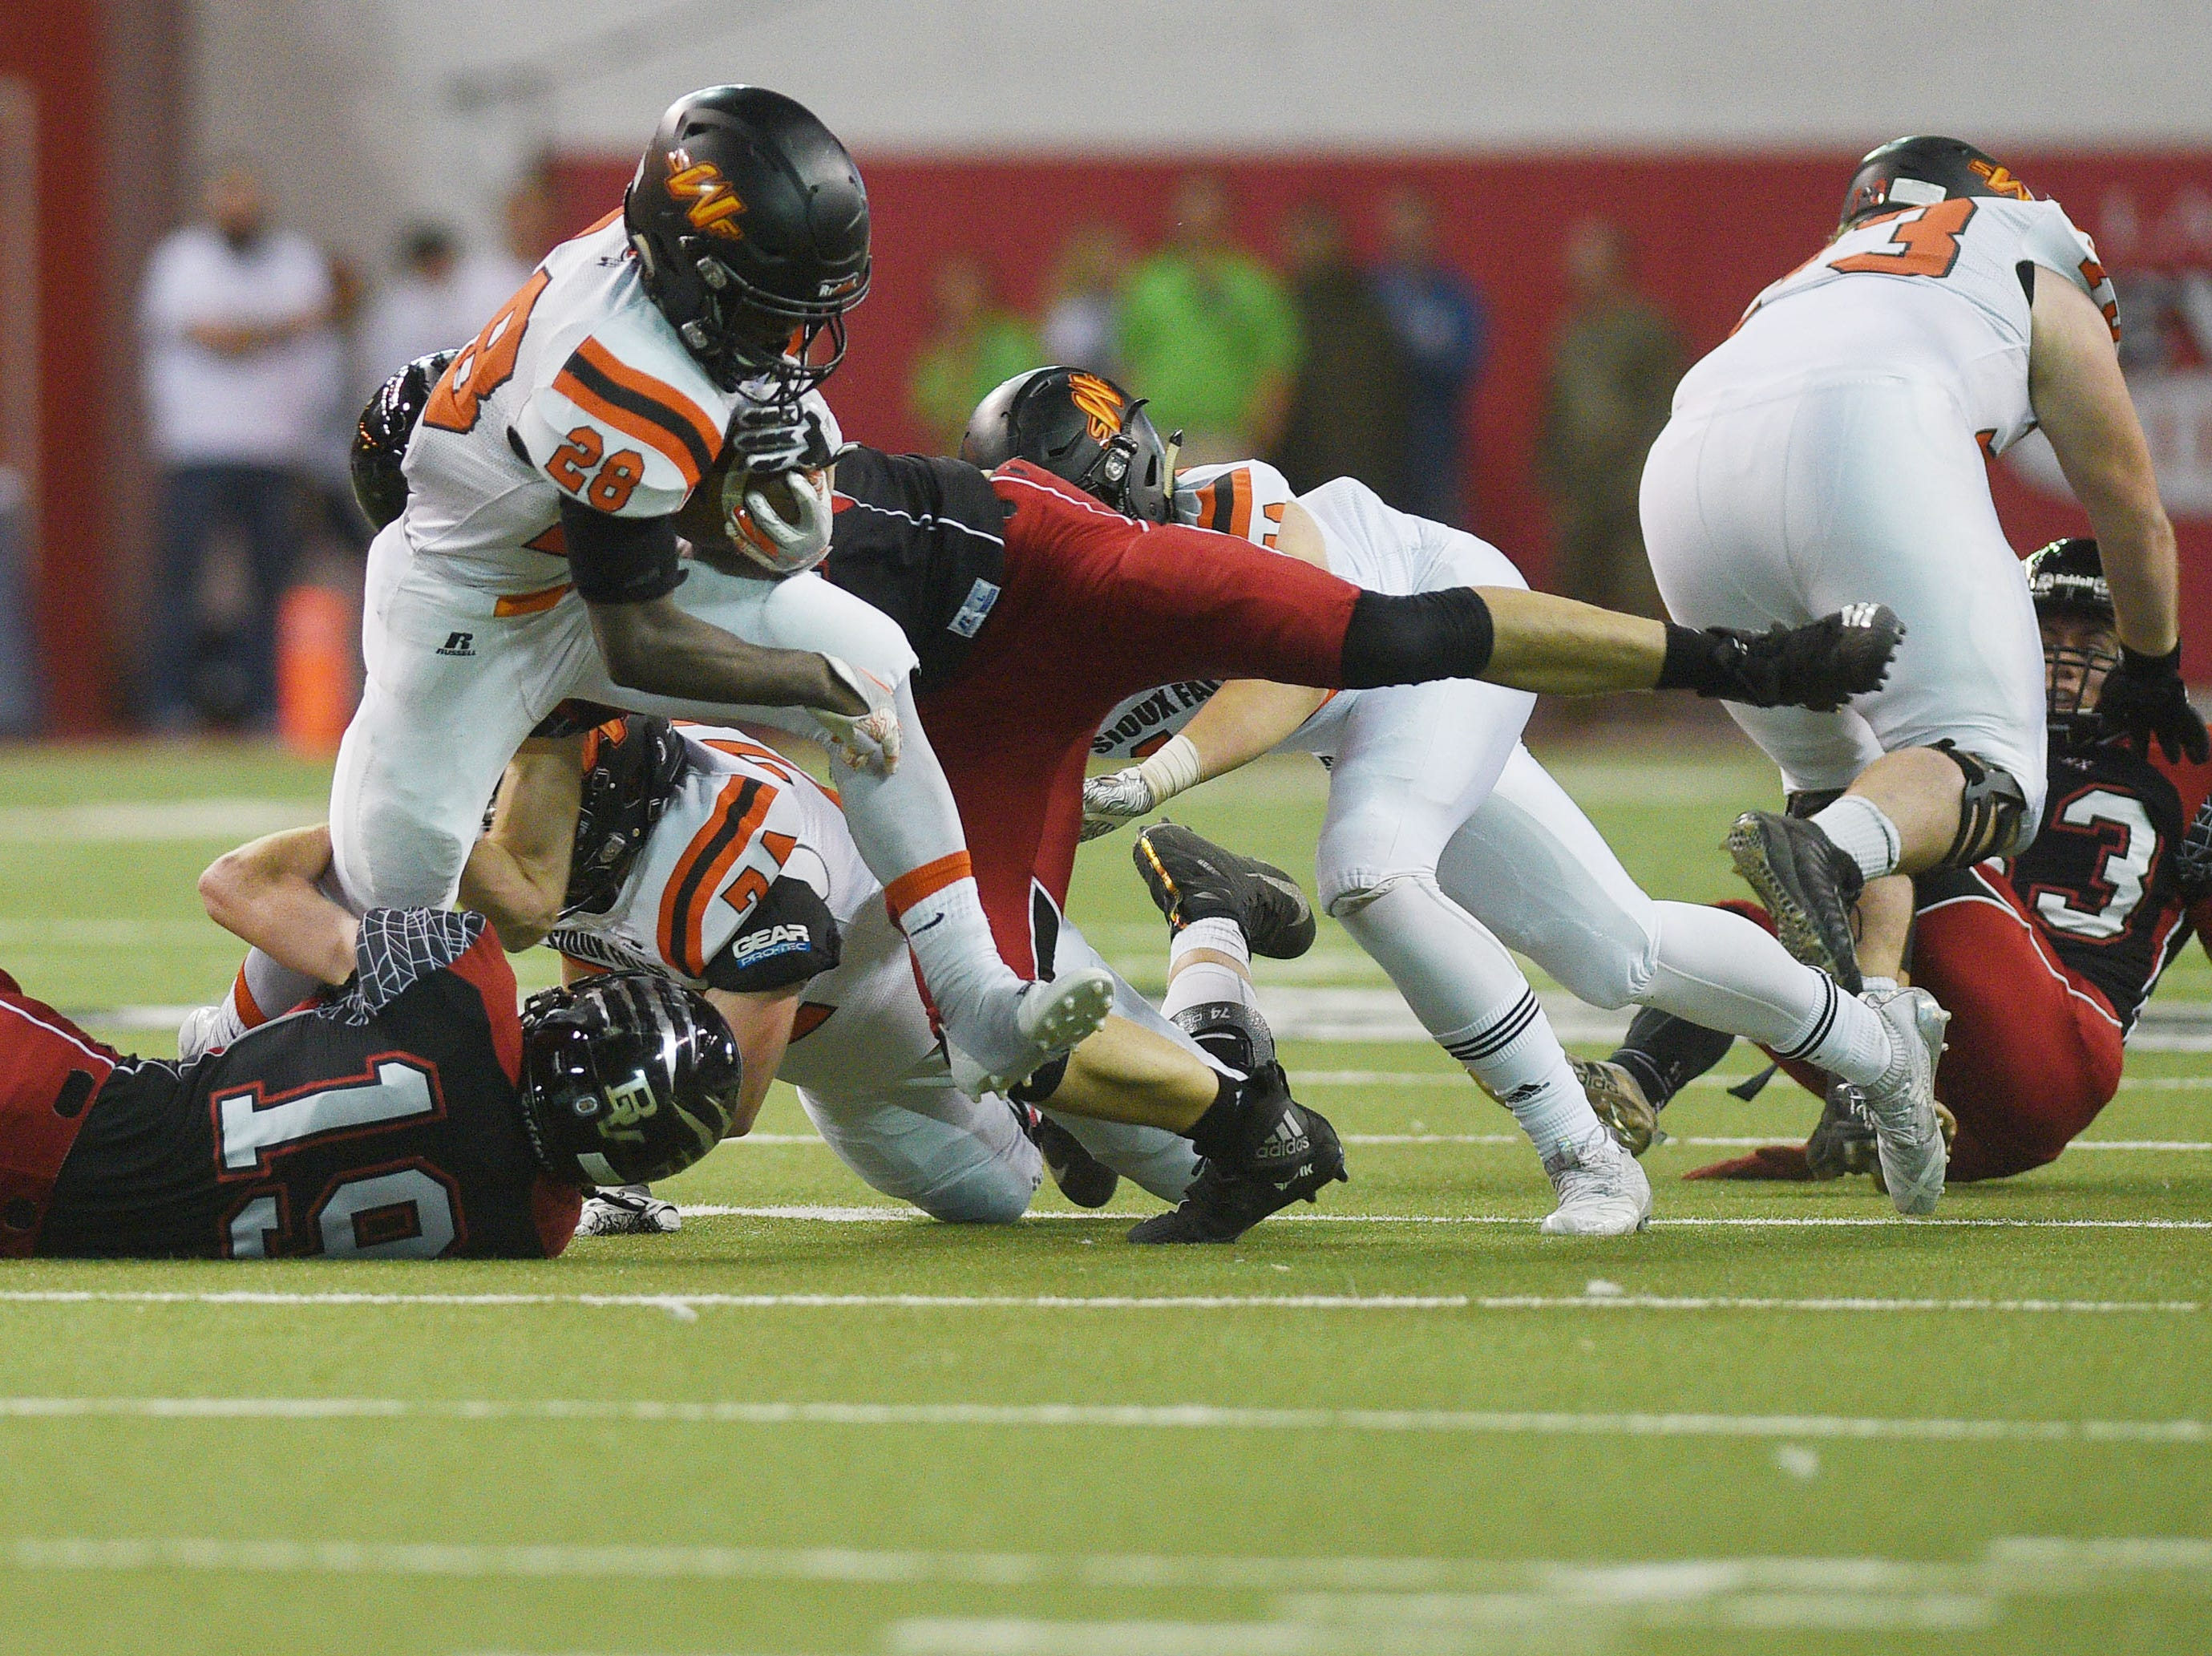 Washington's Tupak Kpeayeh goes against Brandon Valley defense during the game Saturday, Nov. 10, at the DakotaDome in Vermillion.